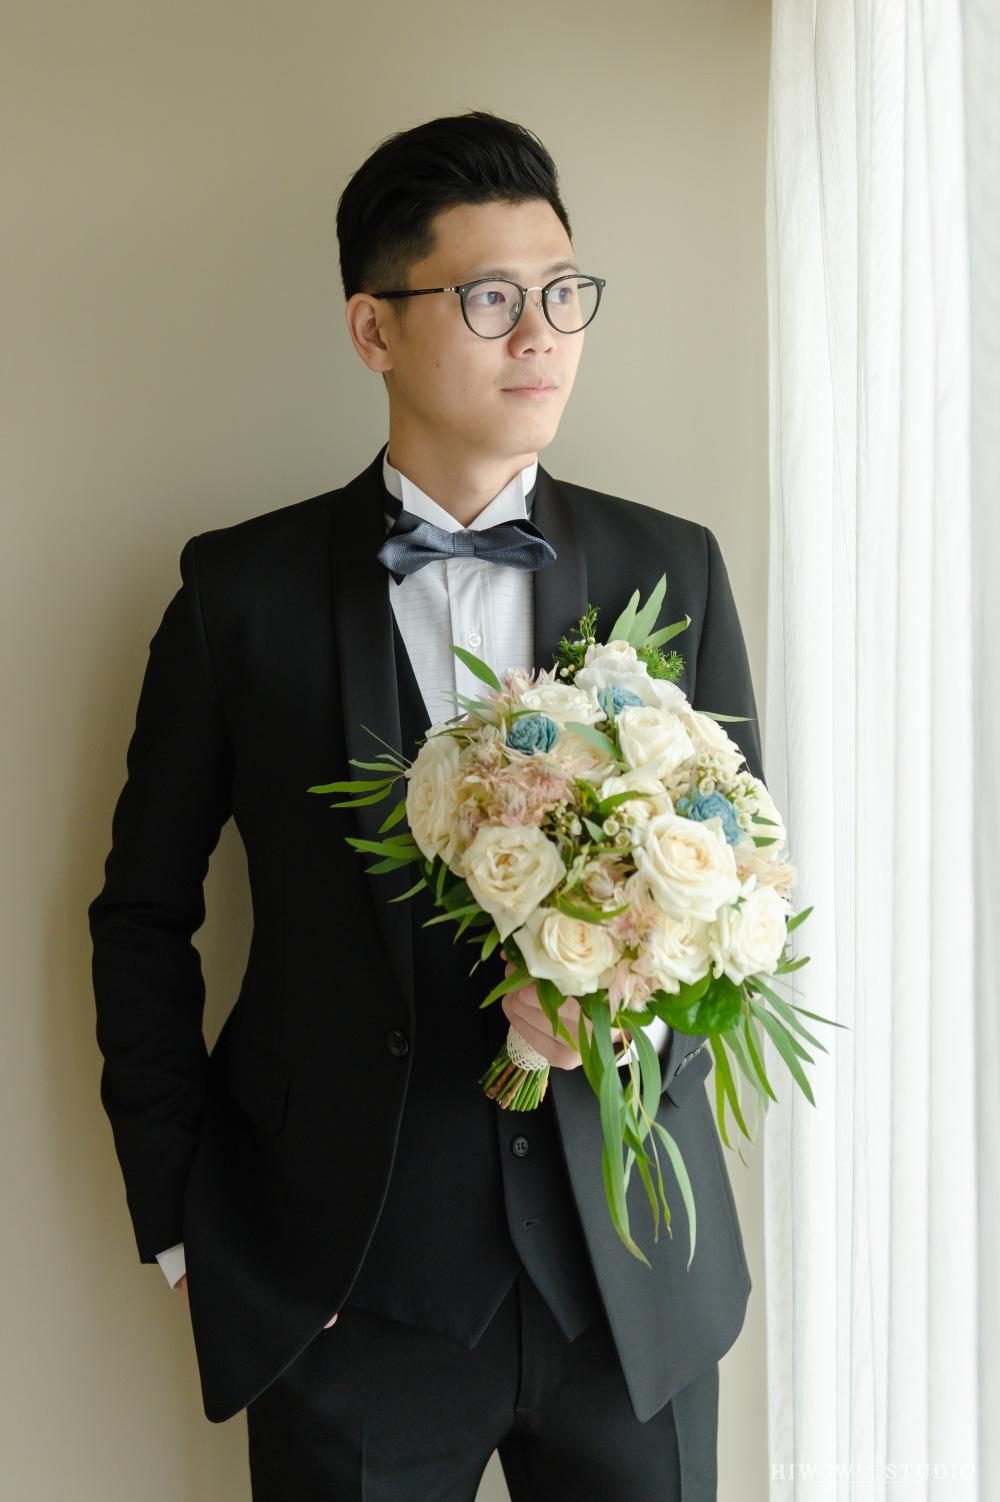 hiwow.studio/海蛙攝影/婚攝海蛙/婚禮紀錄/拍婚禮/世貿三三/國賓飯店